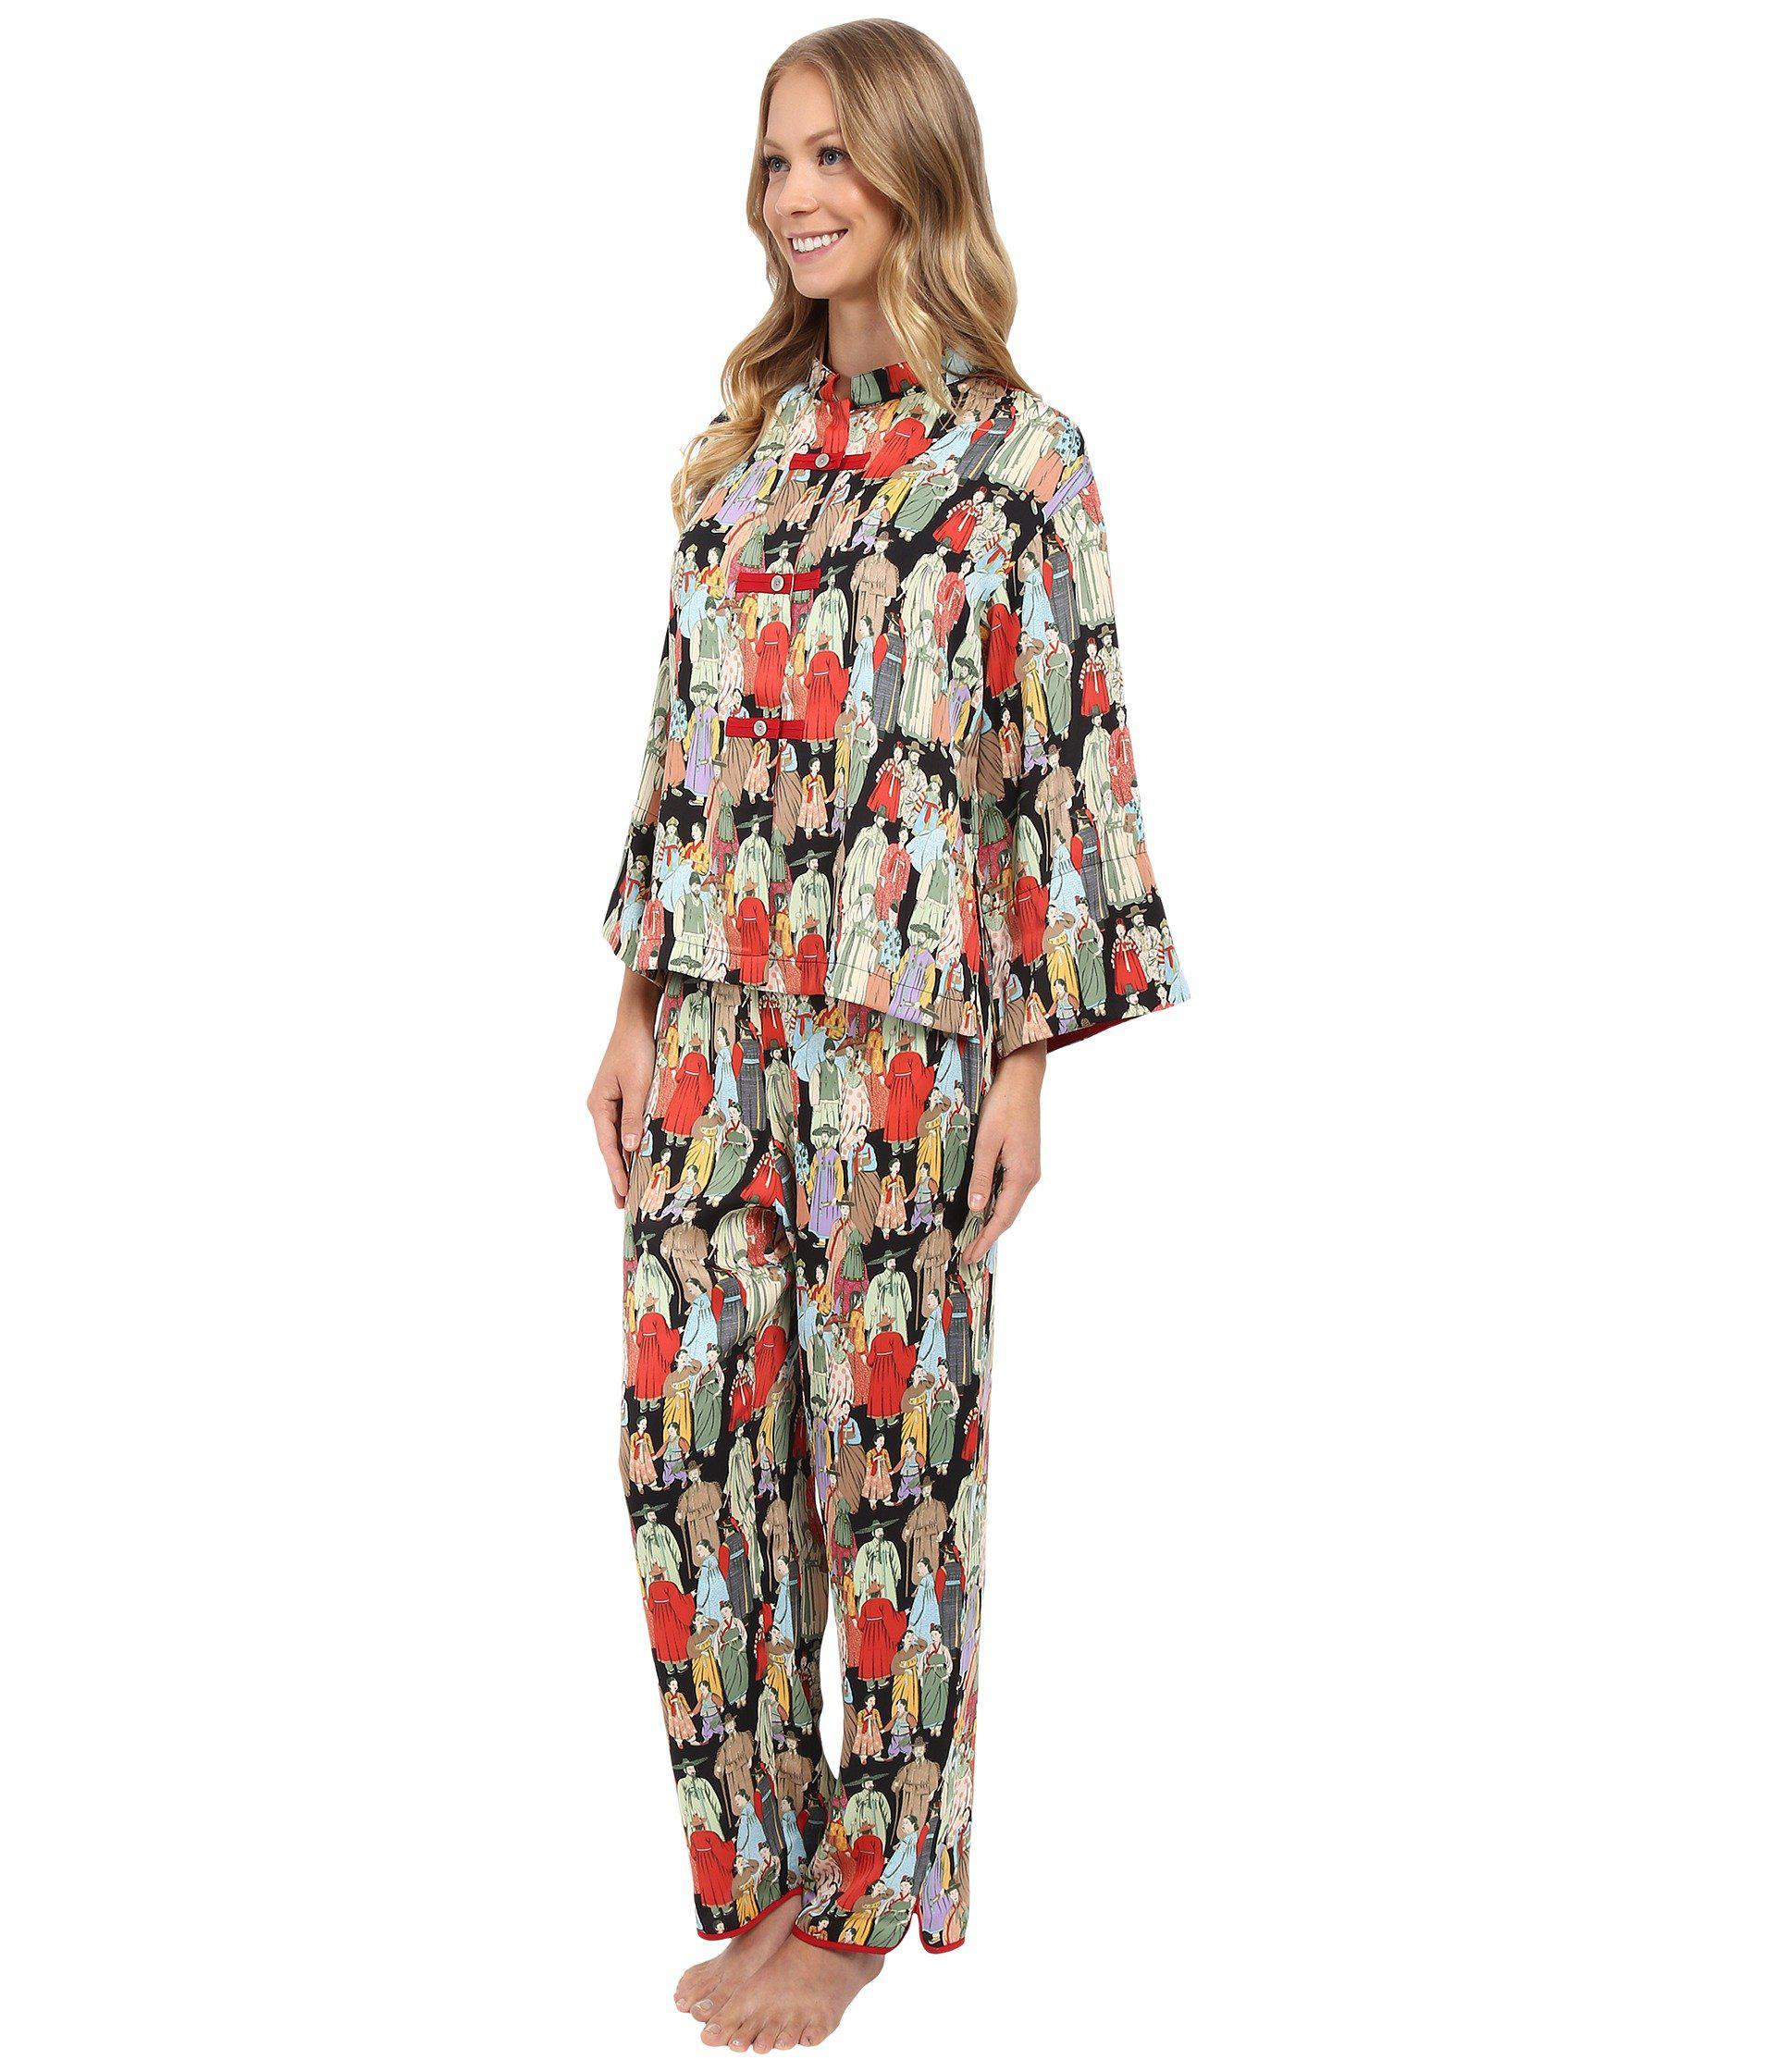 090ce9c614 Lyst - Natori Dynasty Pj (black) Women s Pajama Sets in Black